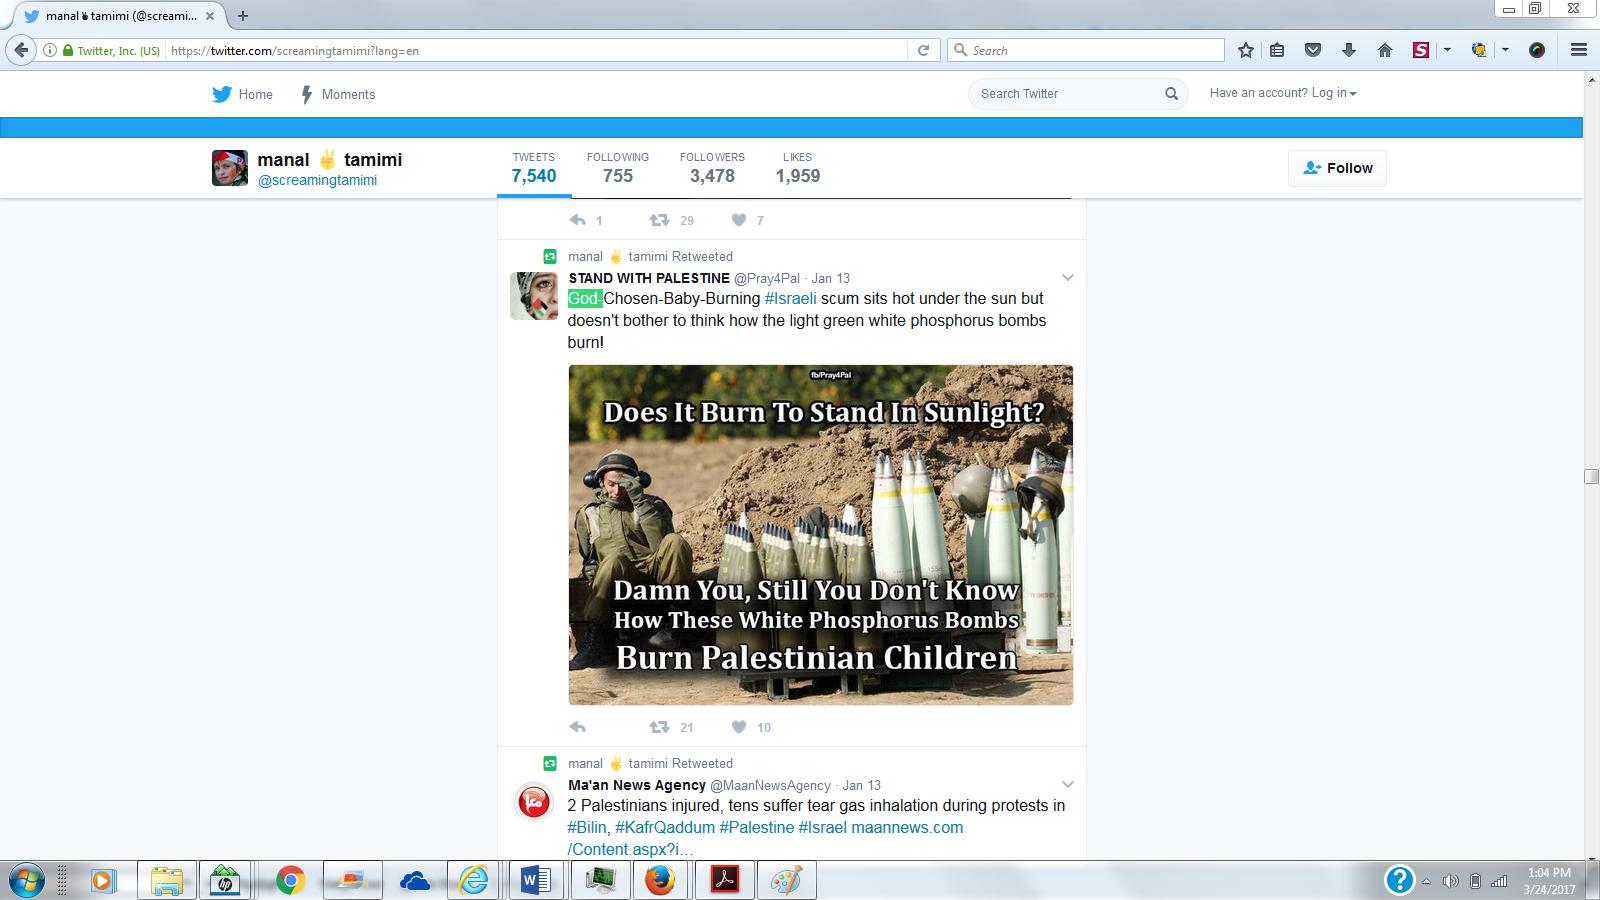 http://humanrightsvoices.us1.list-manage2.com/track/click?u=779a7657507fa1127185b036a&id=ff4486a188&e=8c9c86ab63